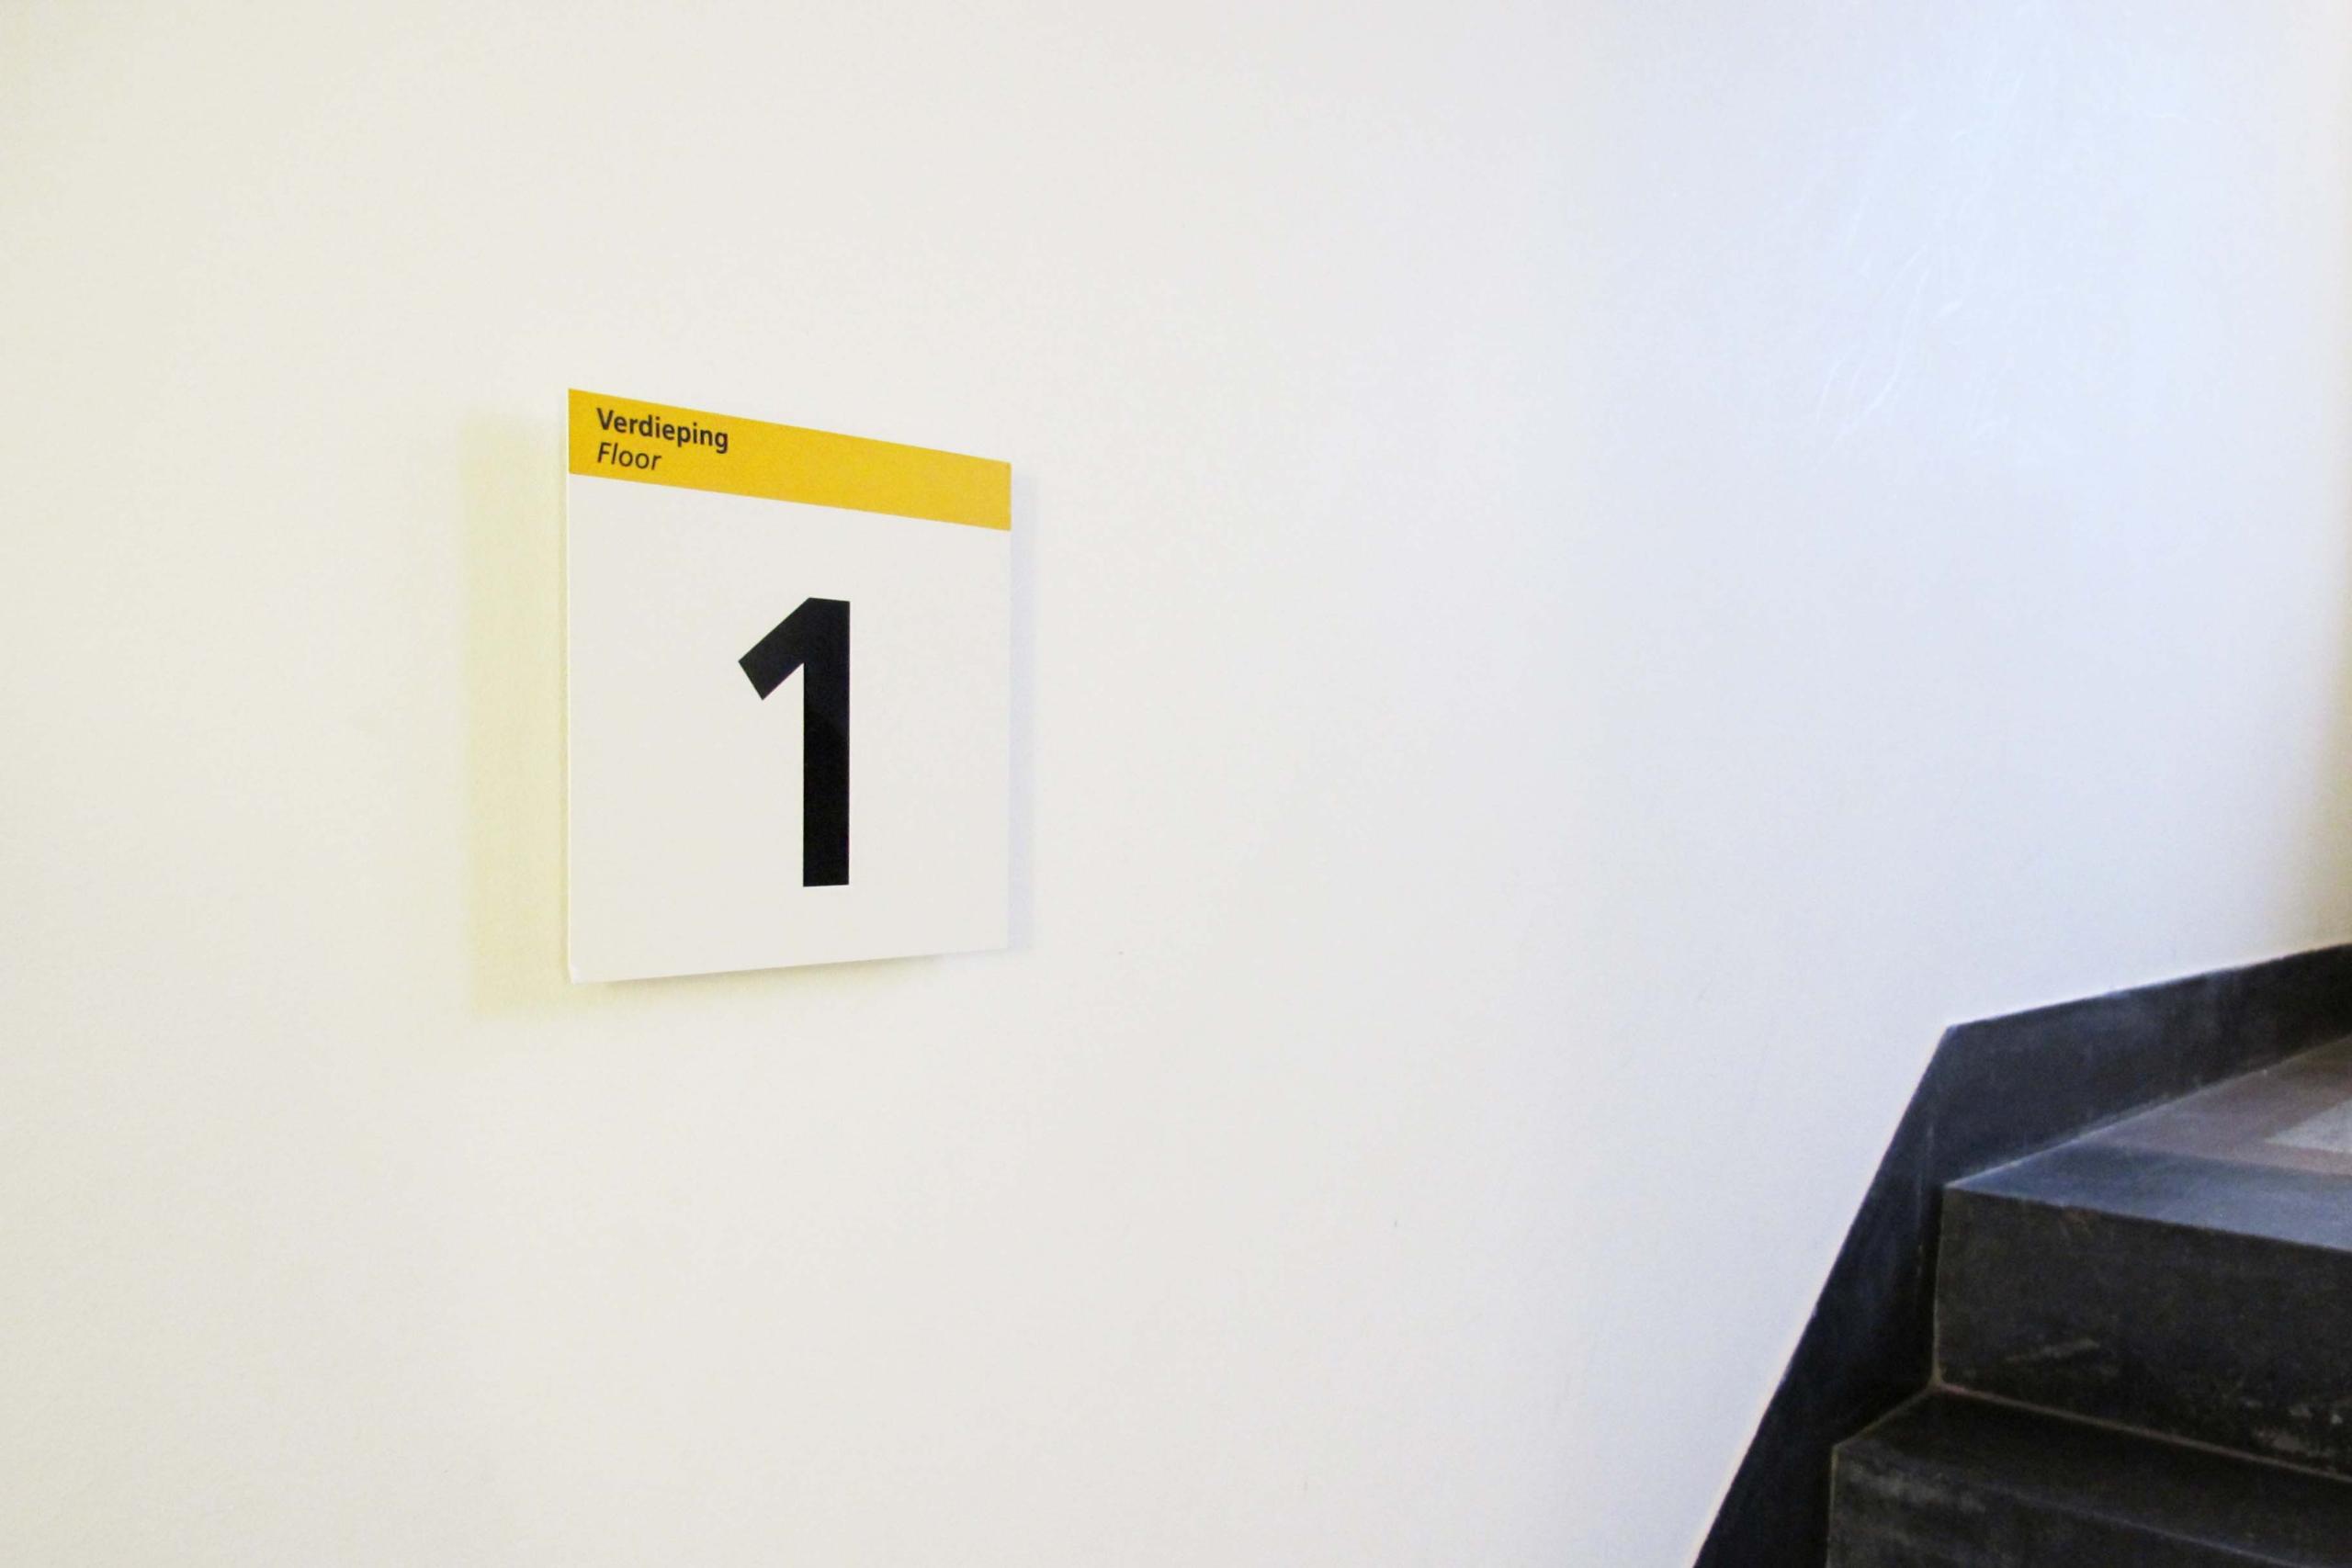 UU - etageaanduiding 1   Groeneveld Sign Systems